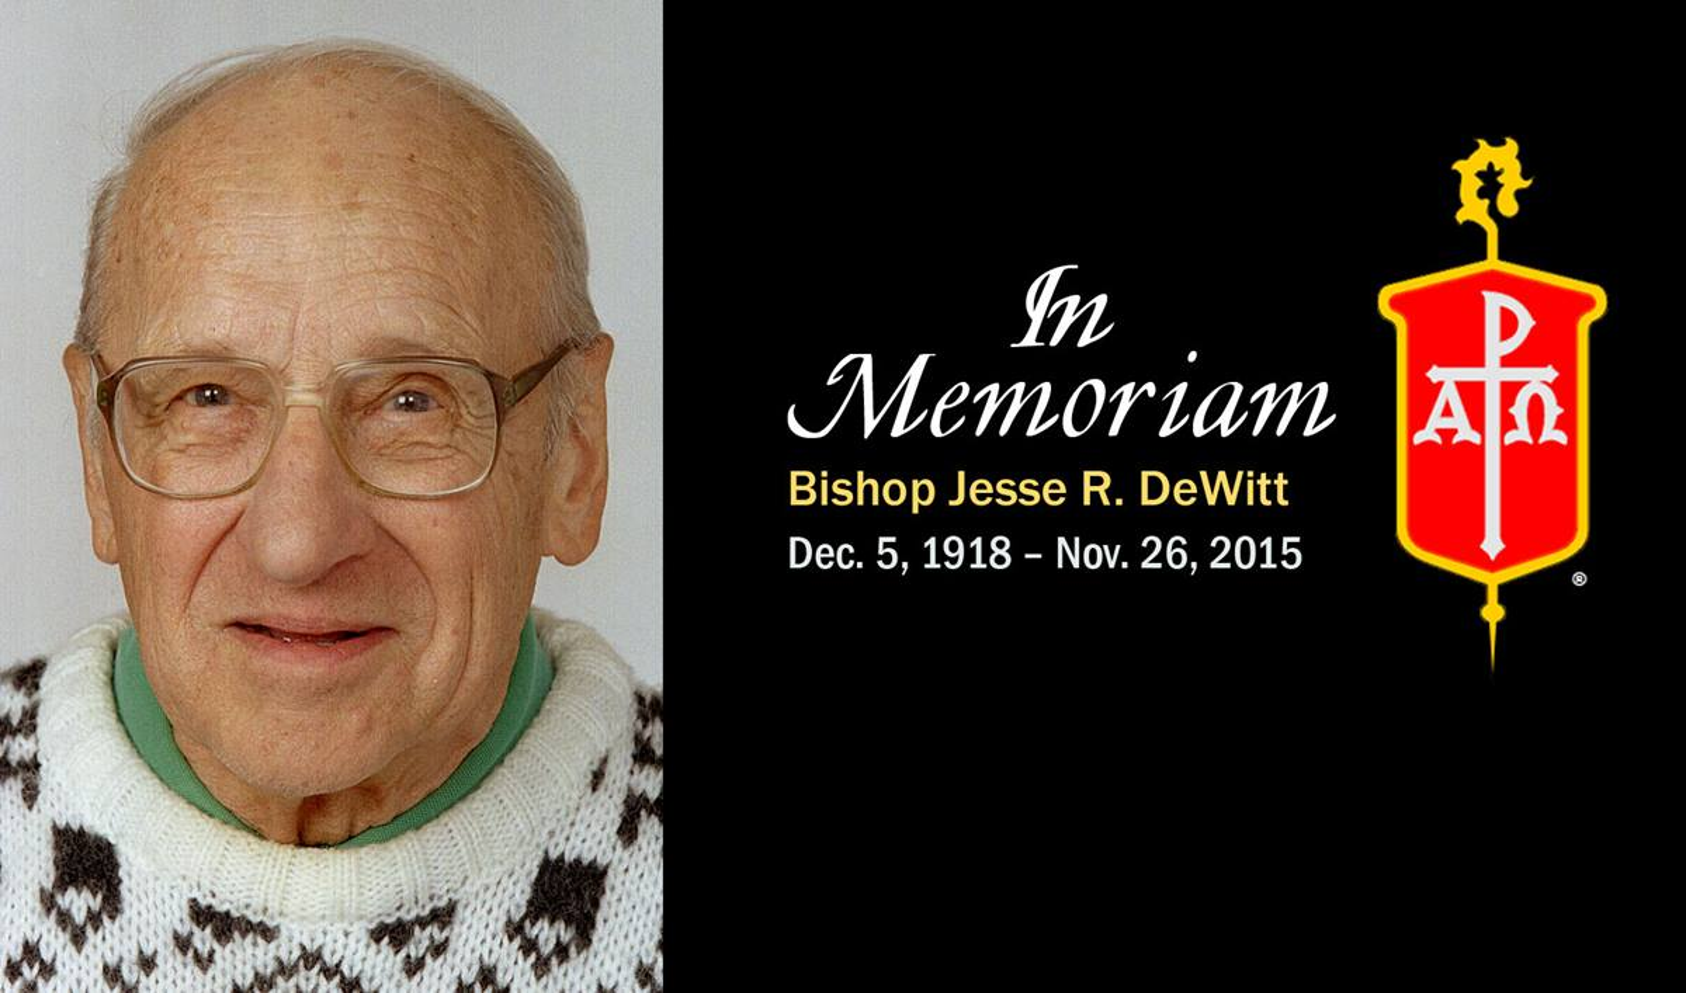 United Methodist Bishop Jesse R. DeWitt. A photo by Mike DuBose, UMNS